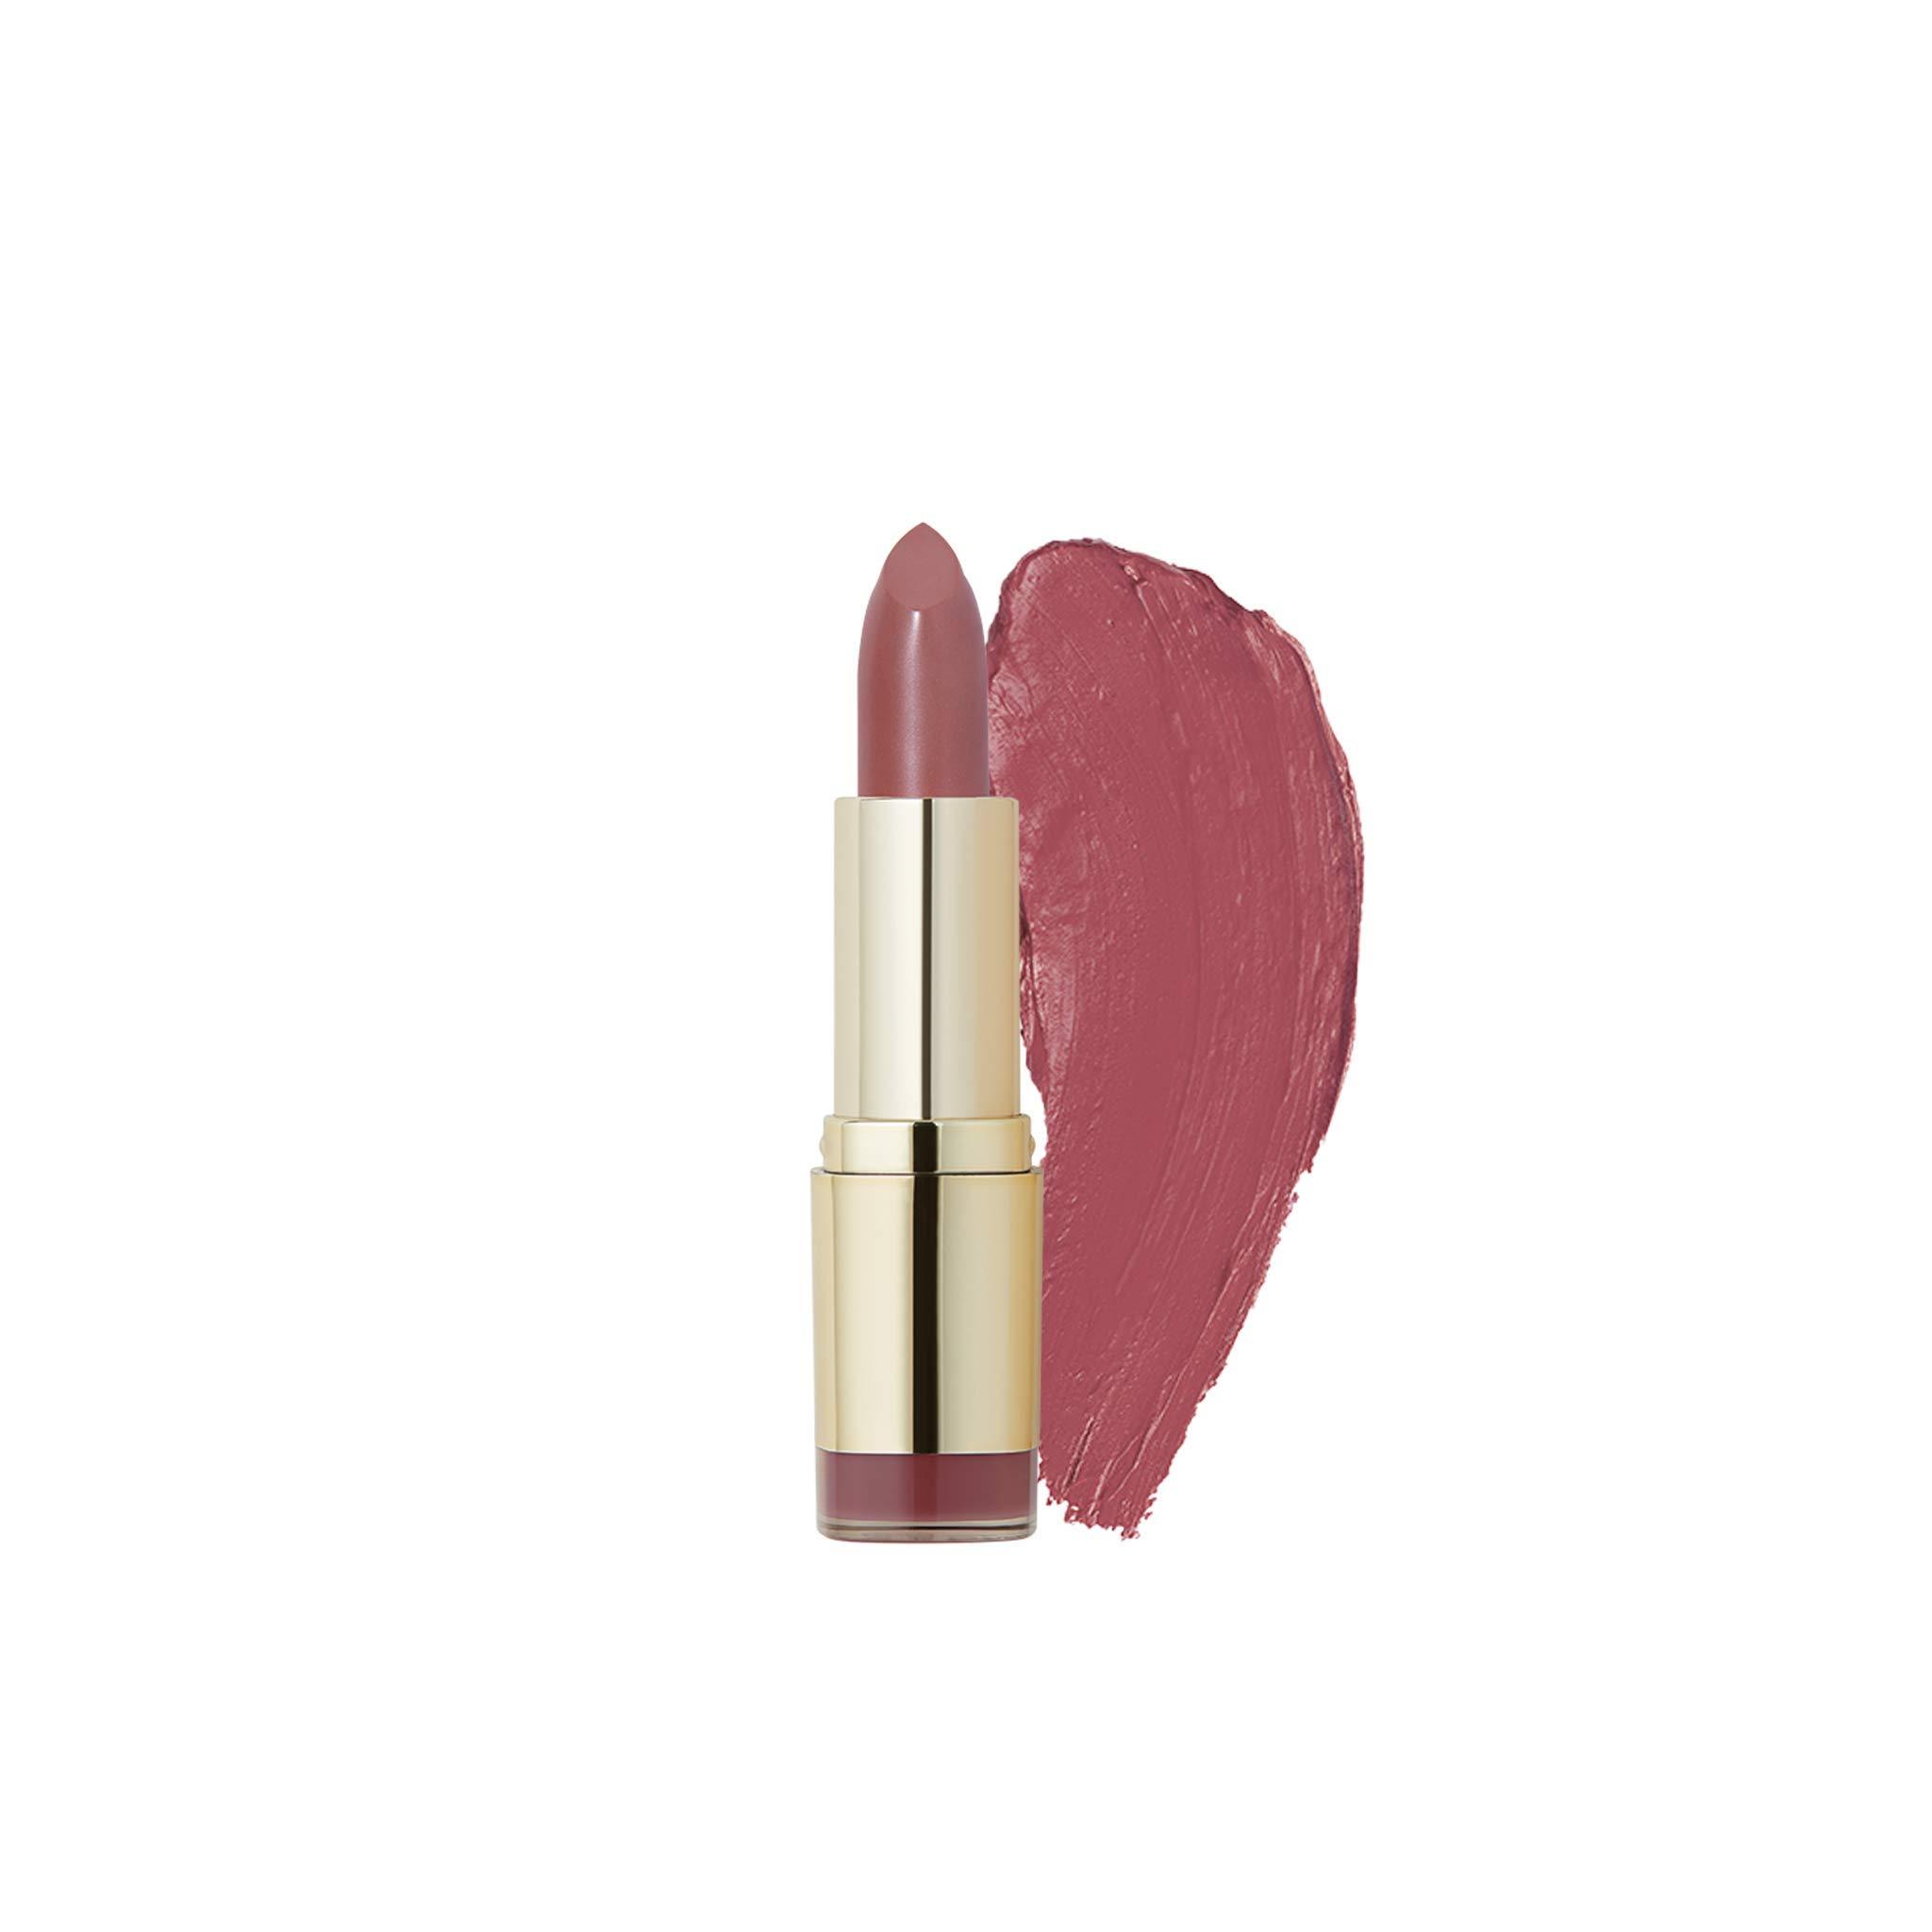 Milani Color Statement Lipstick - Rose Femme, Cruelty-Free Nourishing Lip Stick in Vibrant Shades, Pink Lipstick, 0.14 Ounce